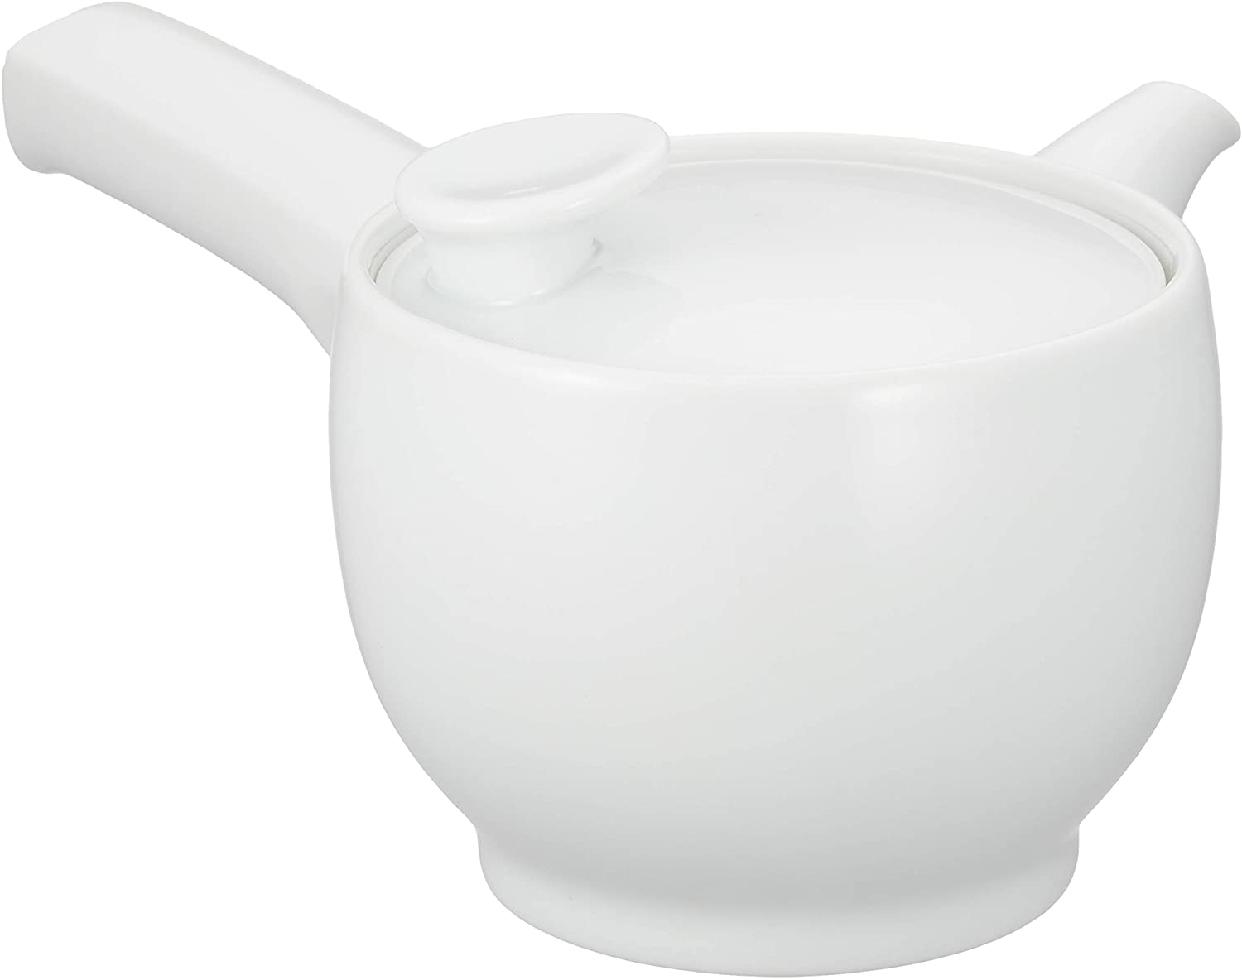 茶和 急須 白磁 右手用 日本製 φ10.5cmの商品画像